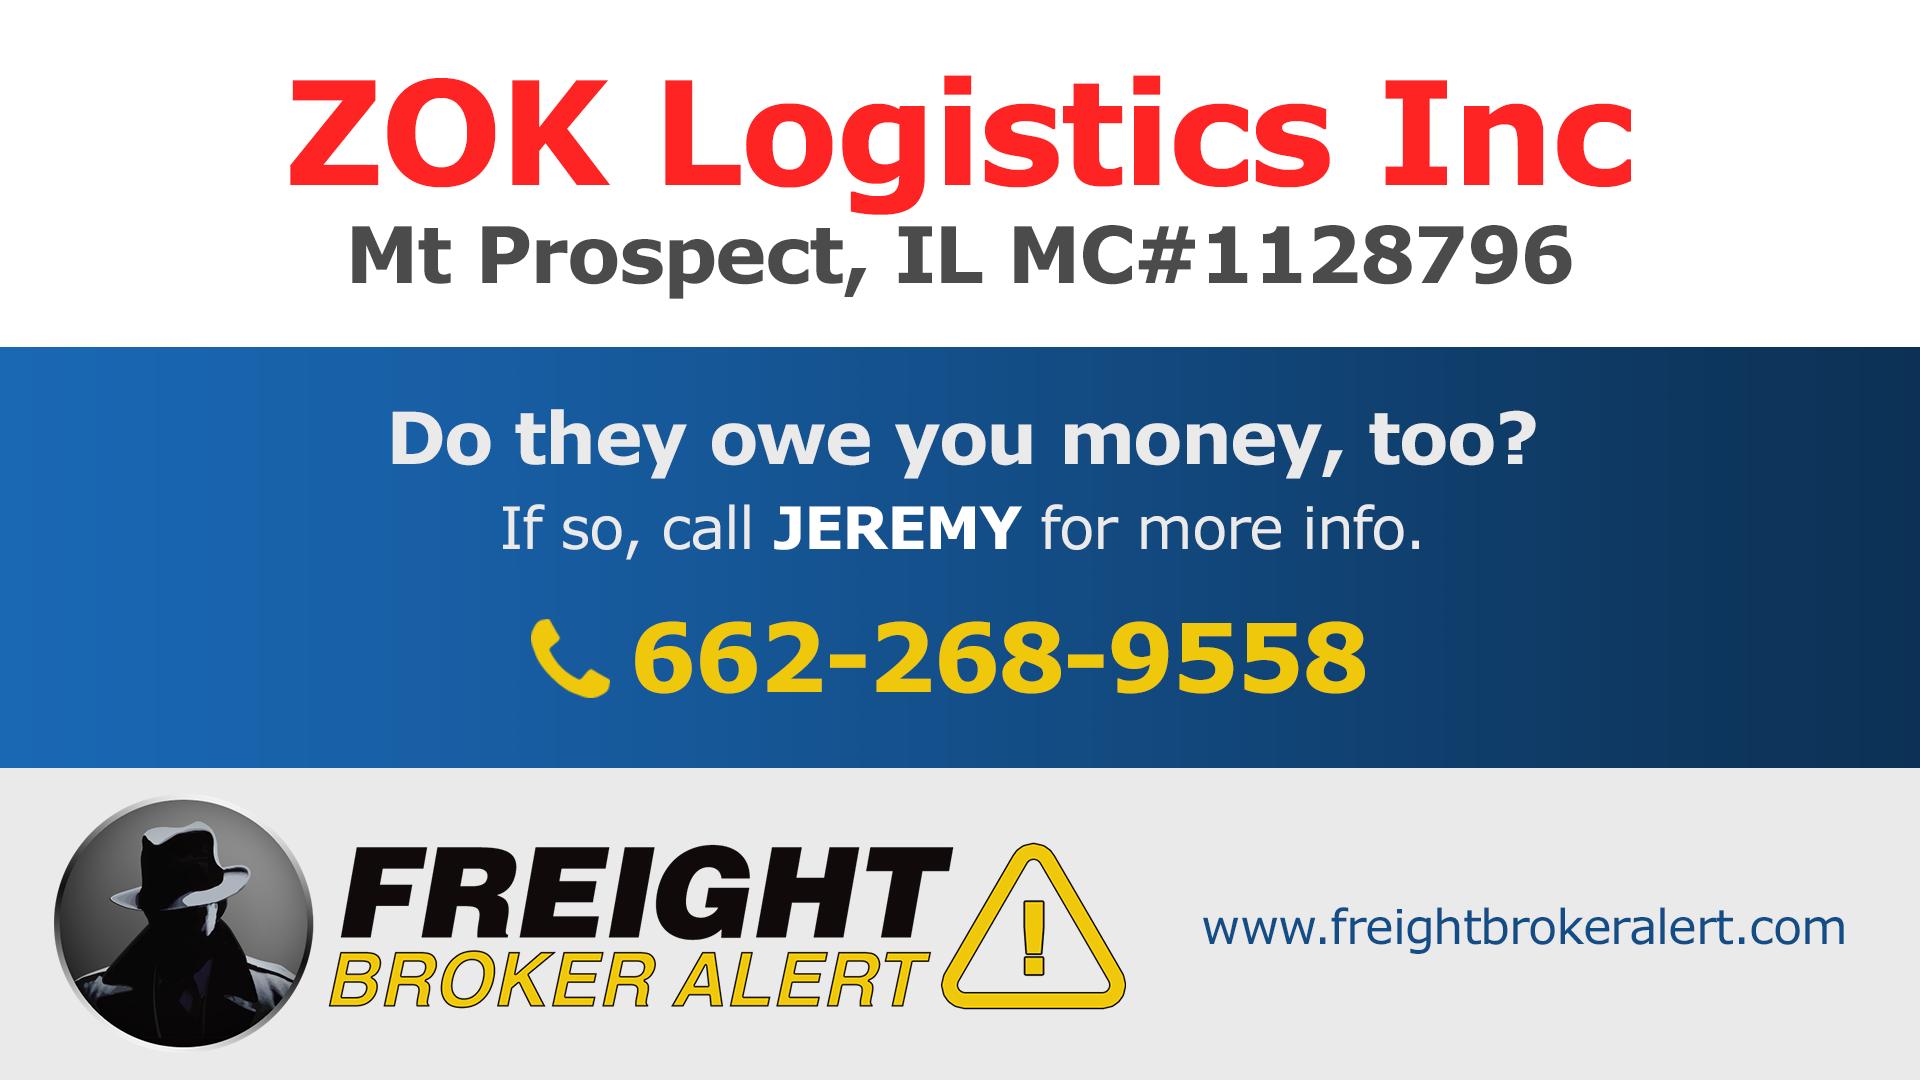 ZOK Logistics Inc Illinois